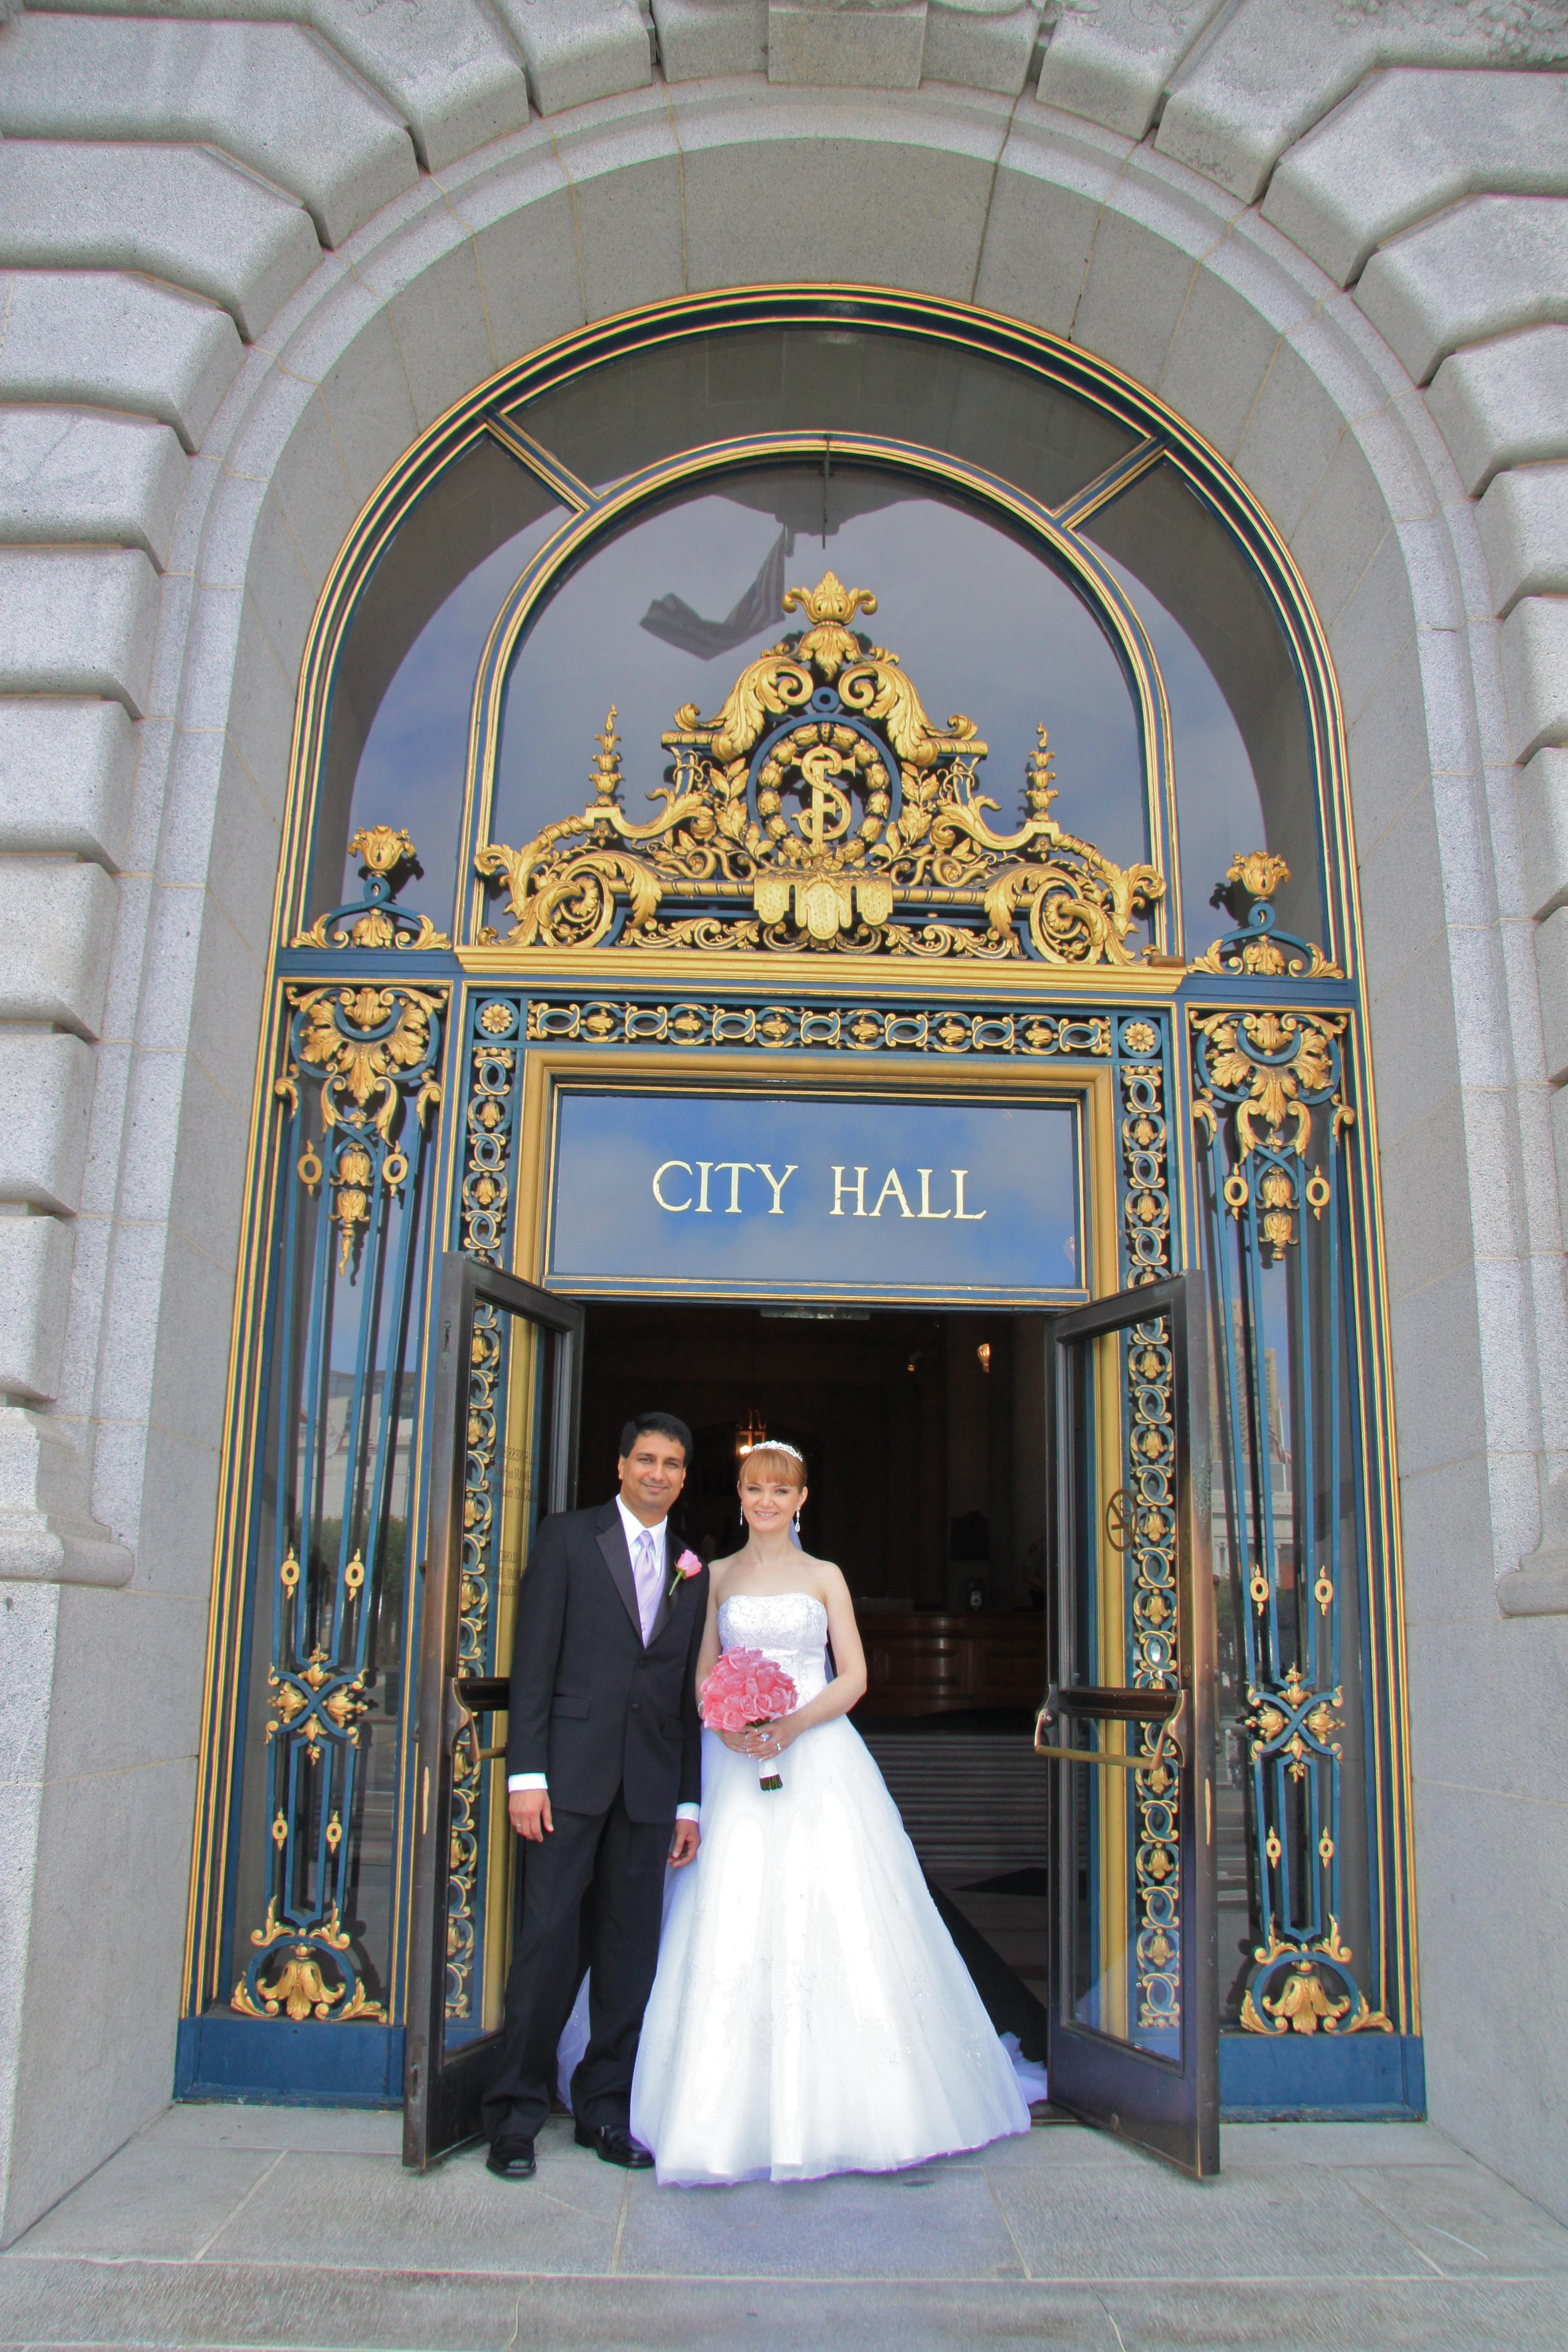 San Francisco Marriage License Details